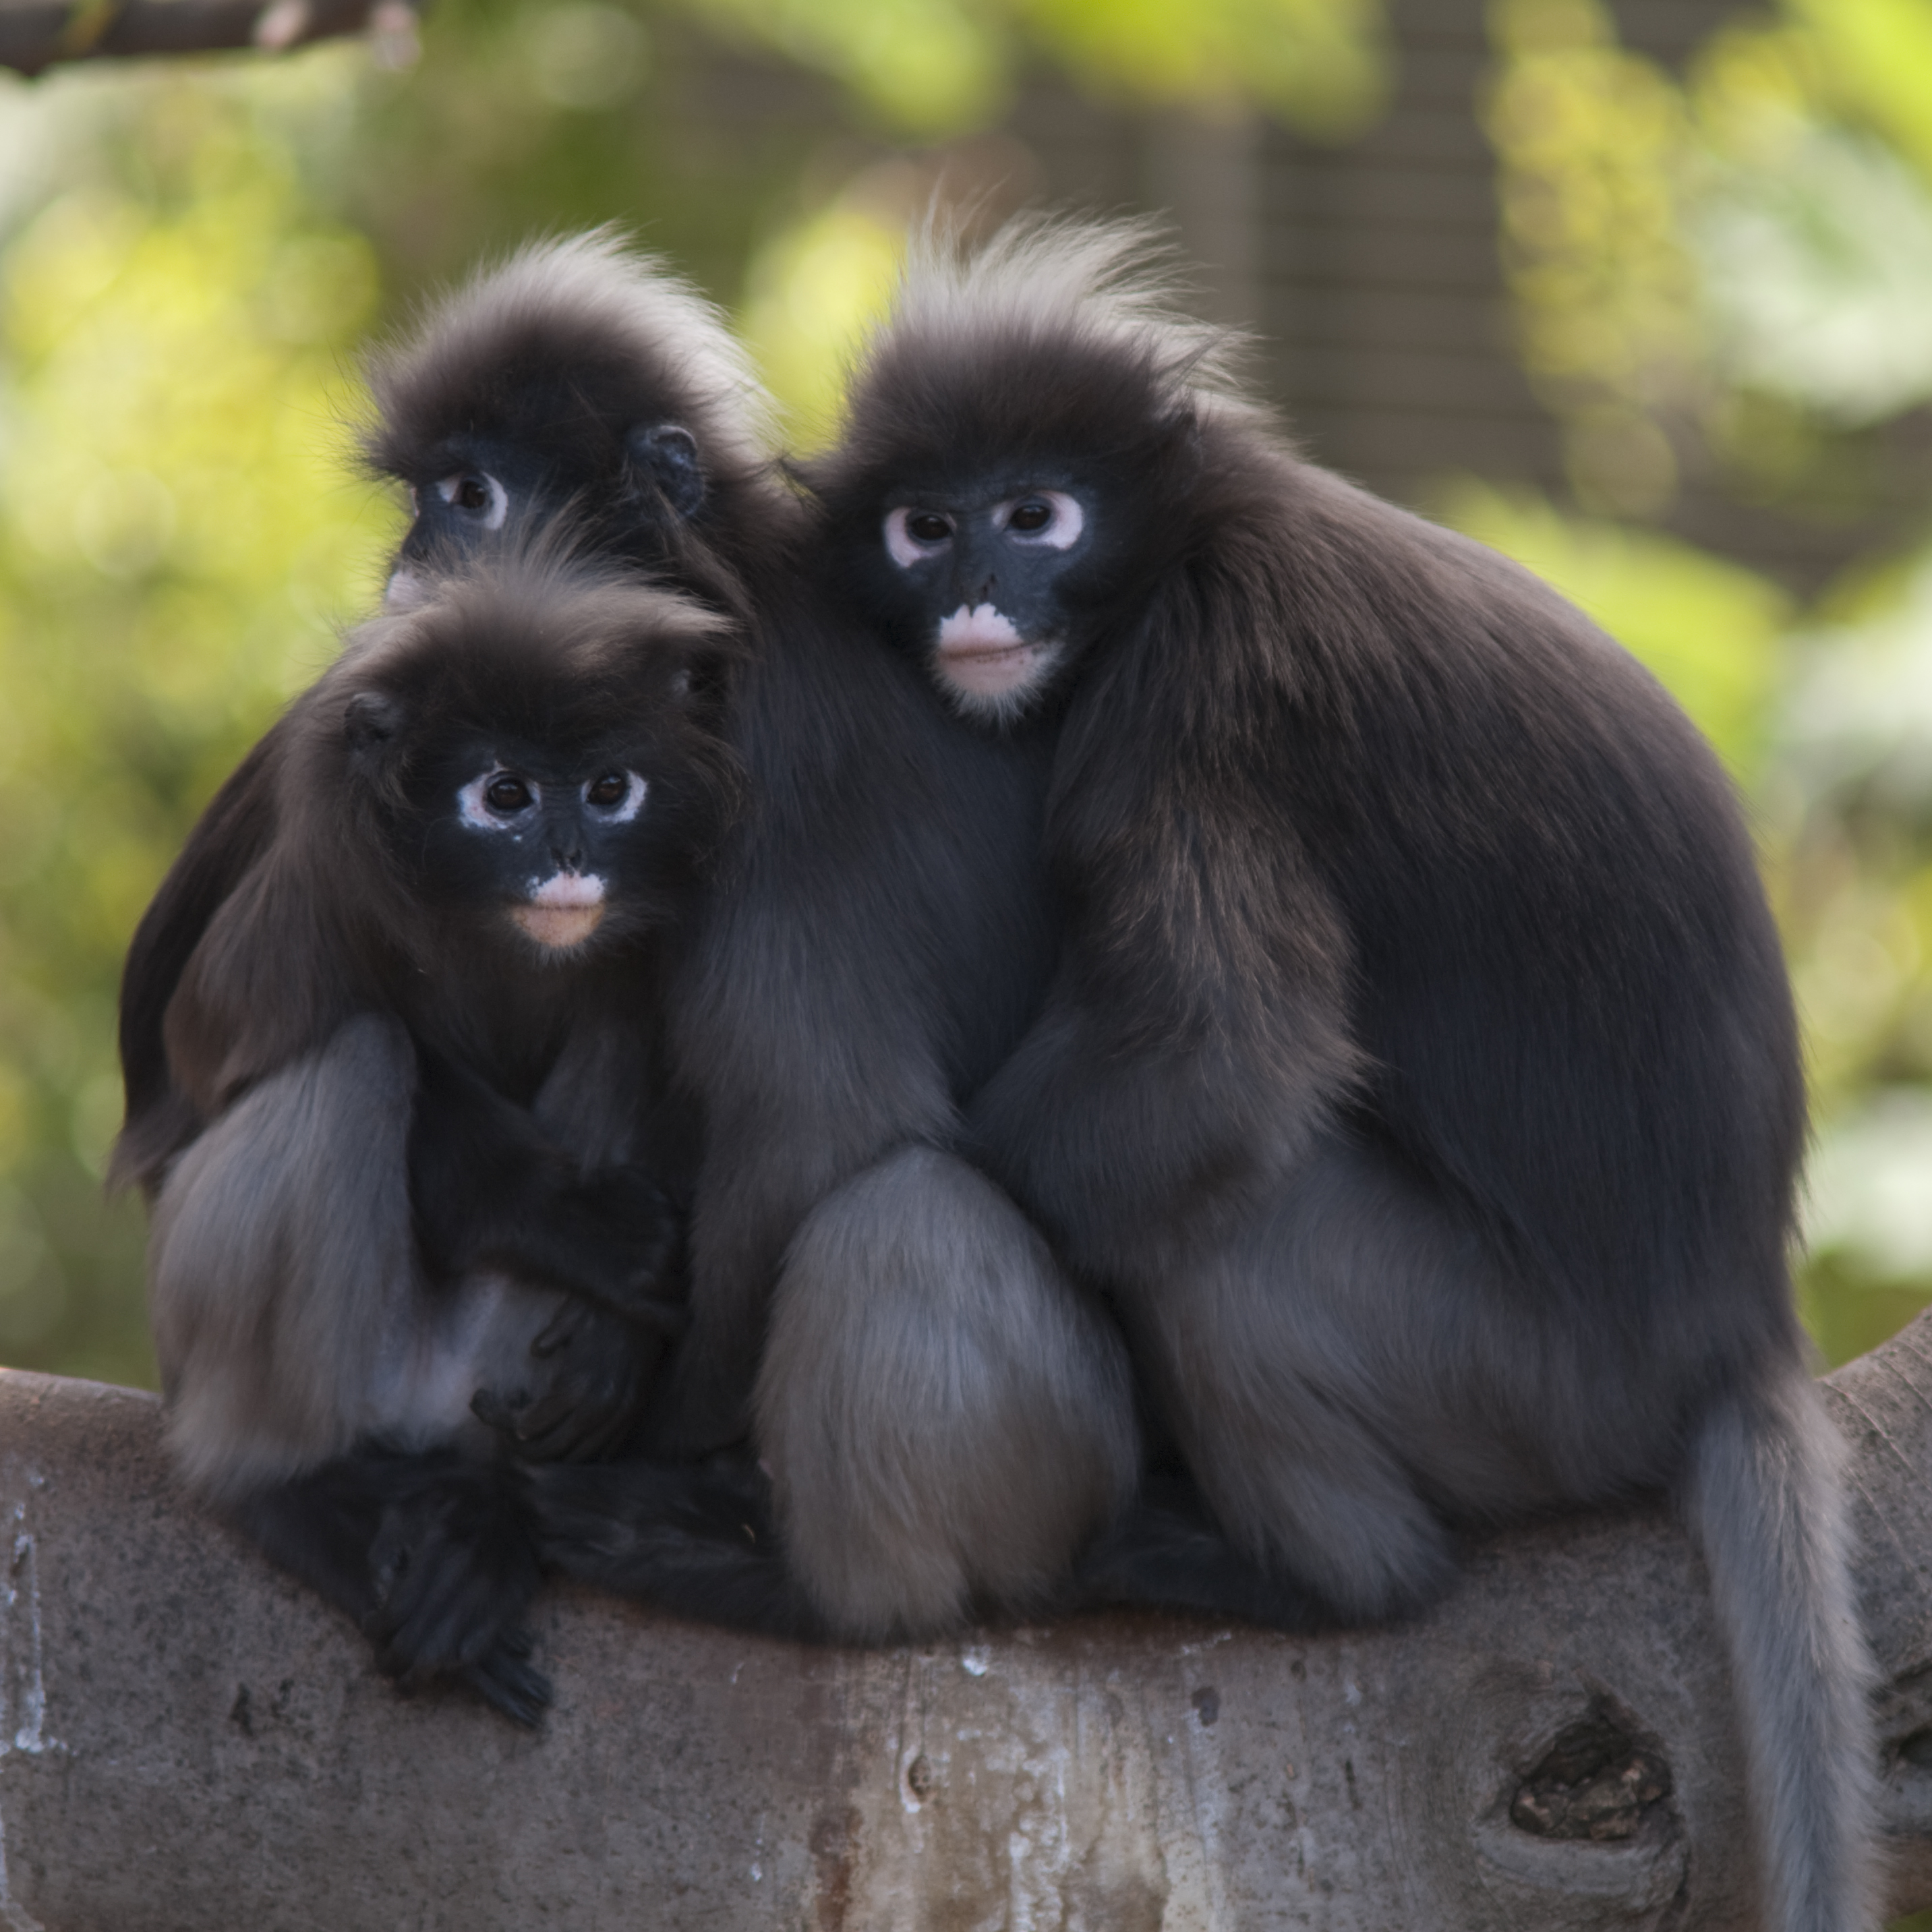 Three hugging monkeys